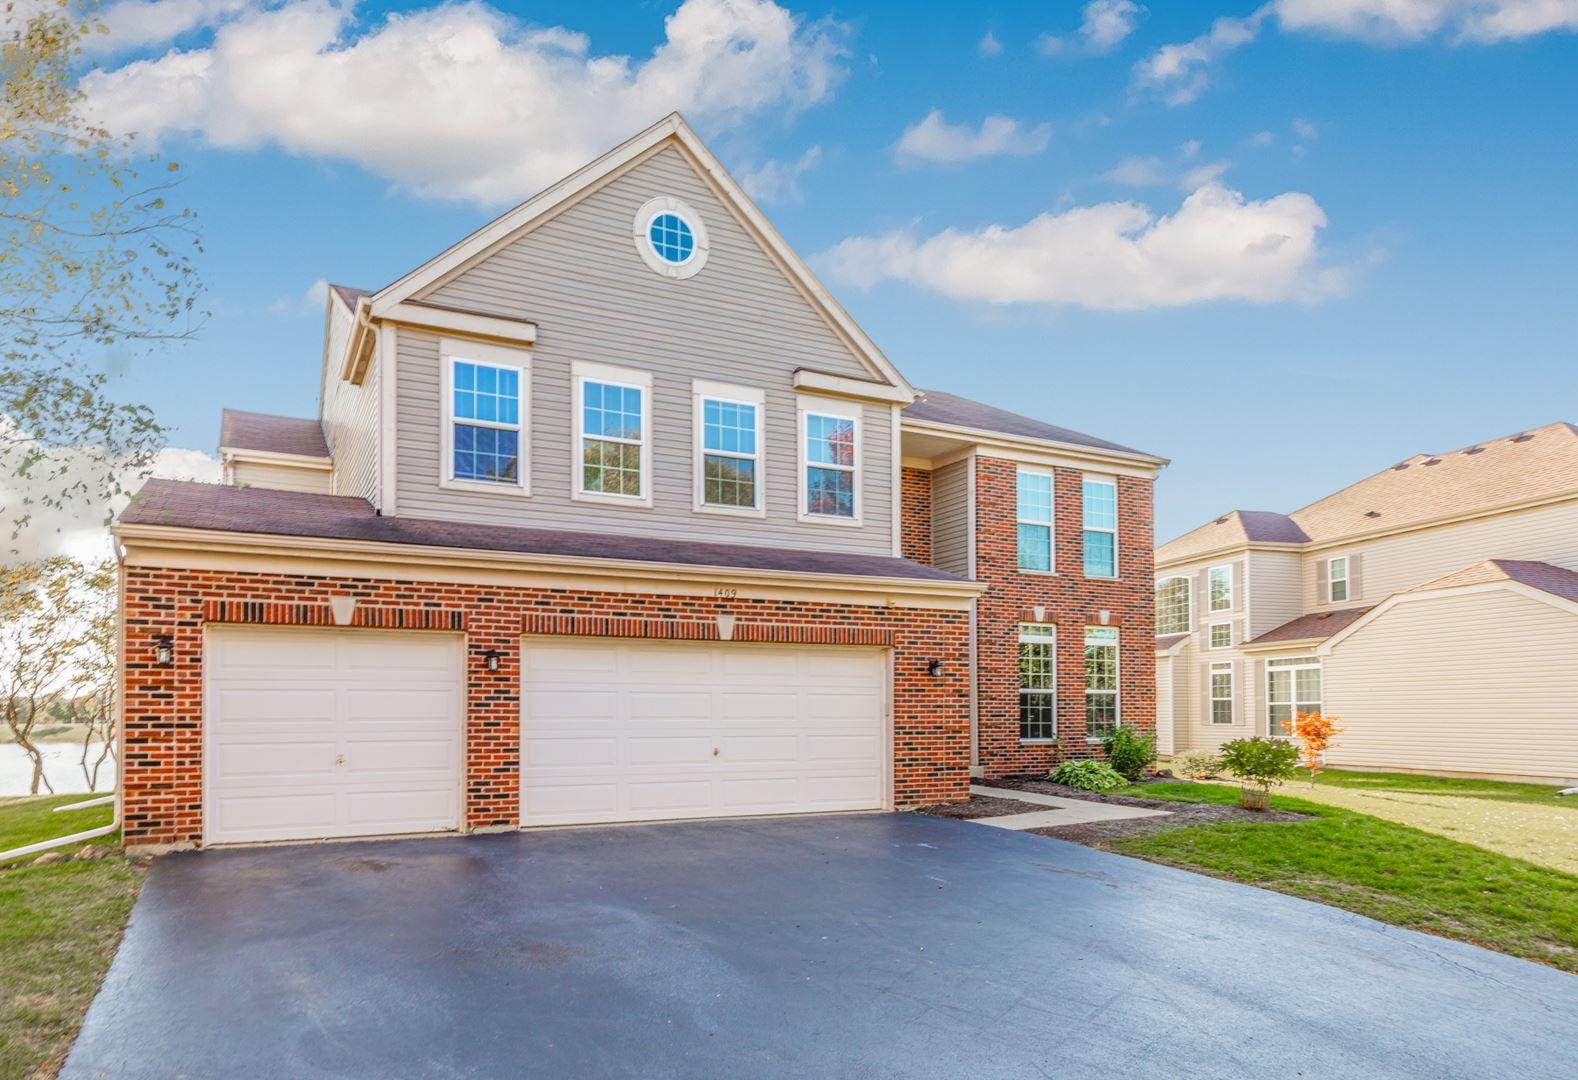 Photo of 1409 Aster Lane, Bolingbrook, IL 60490 (MLS # 10898381)